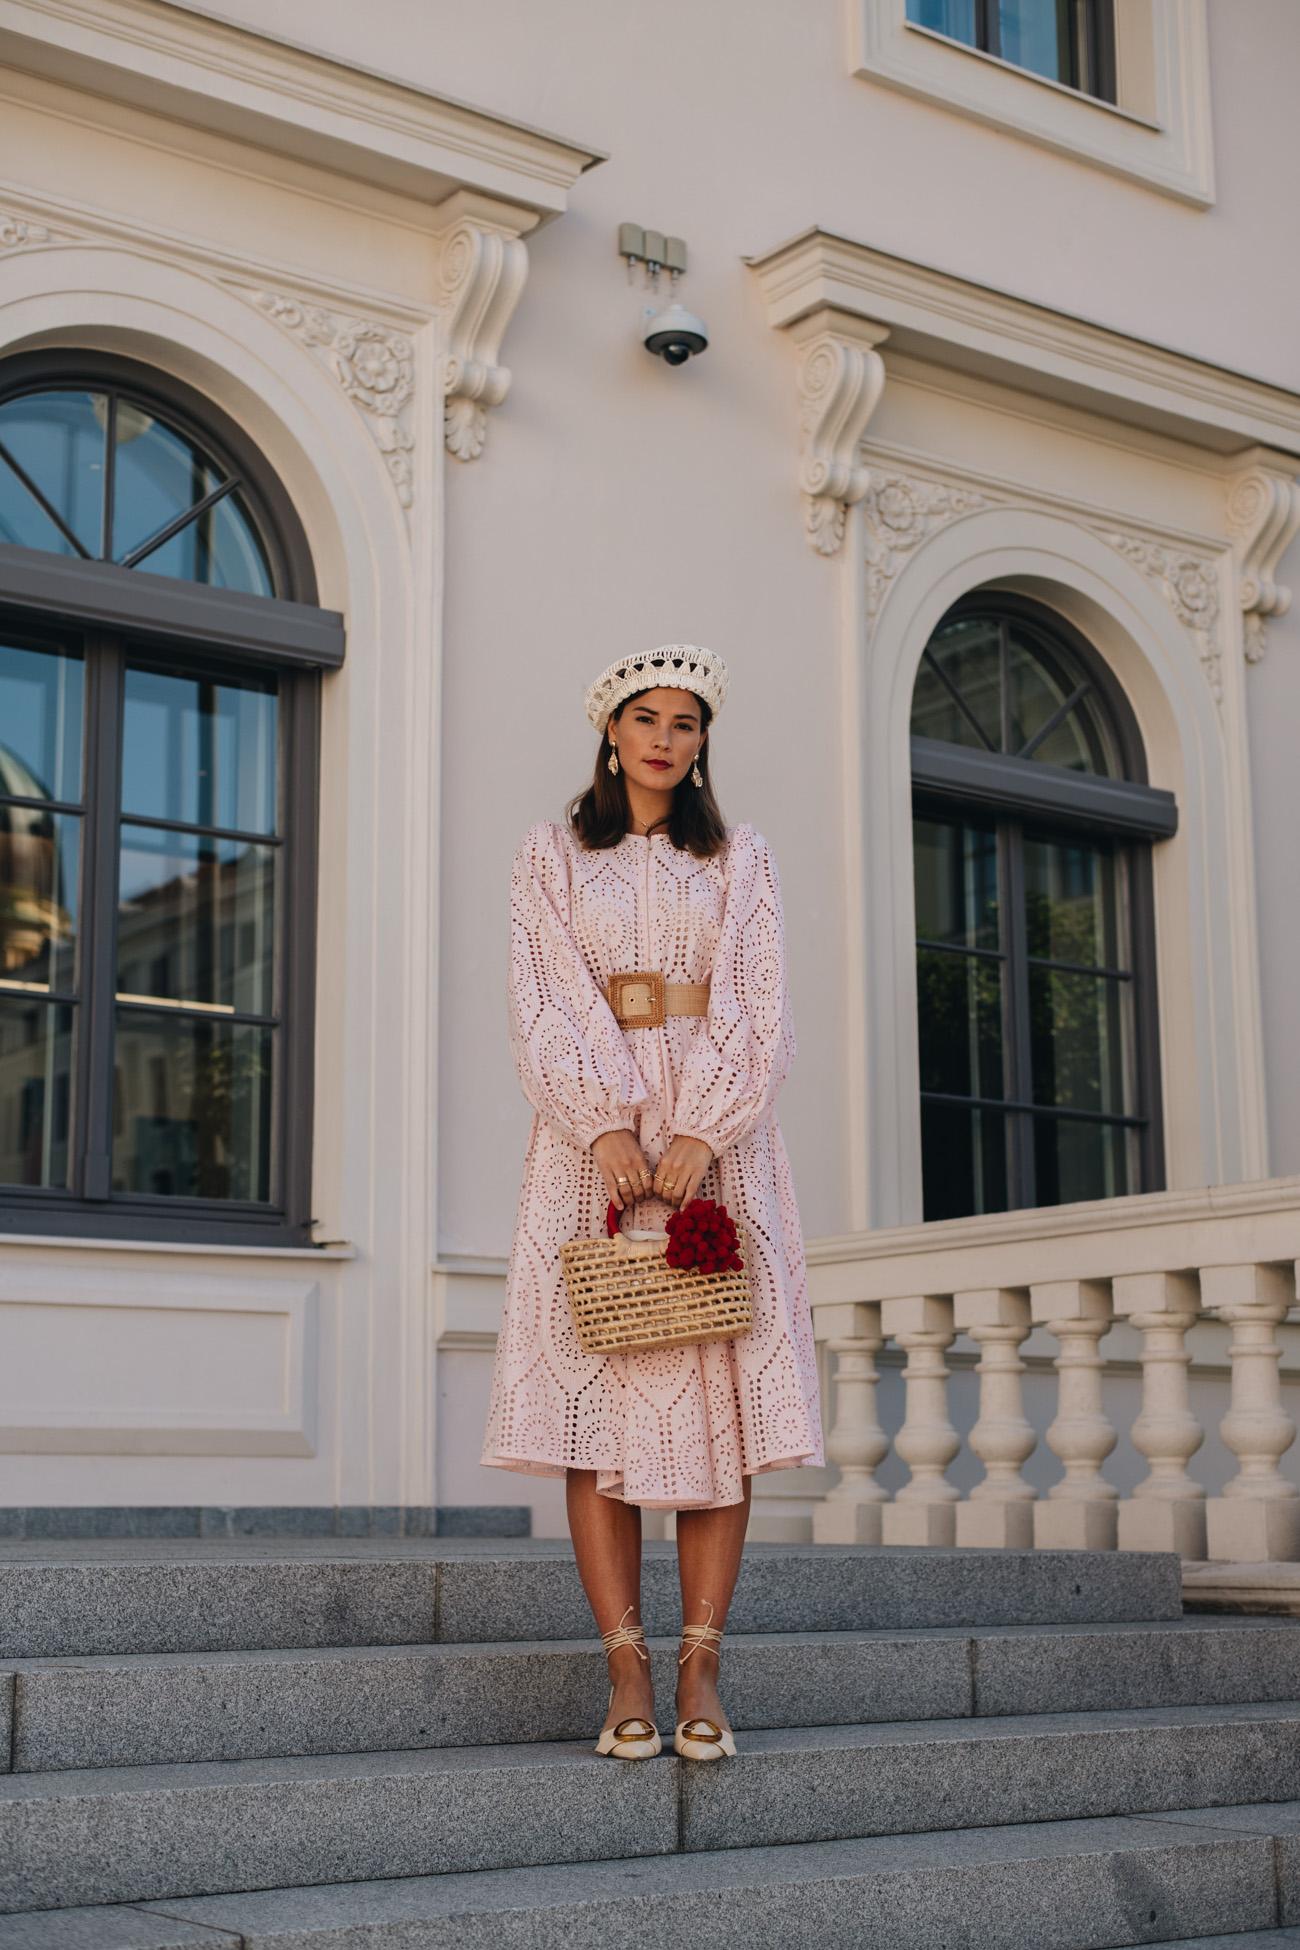 Büro Outfit mit Kleid